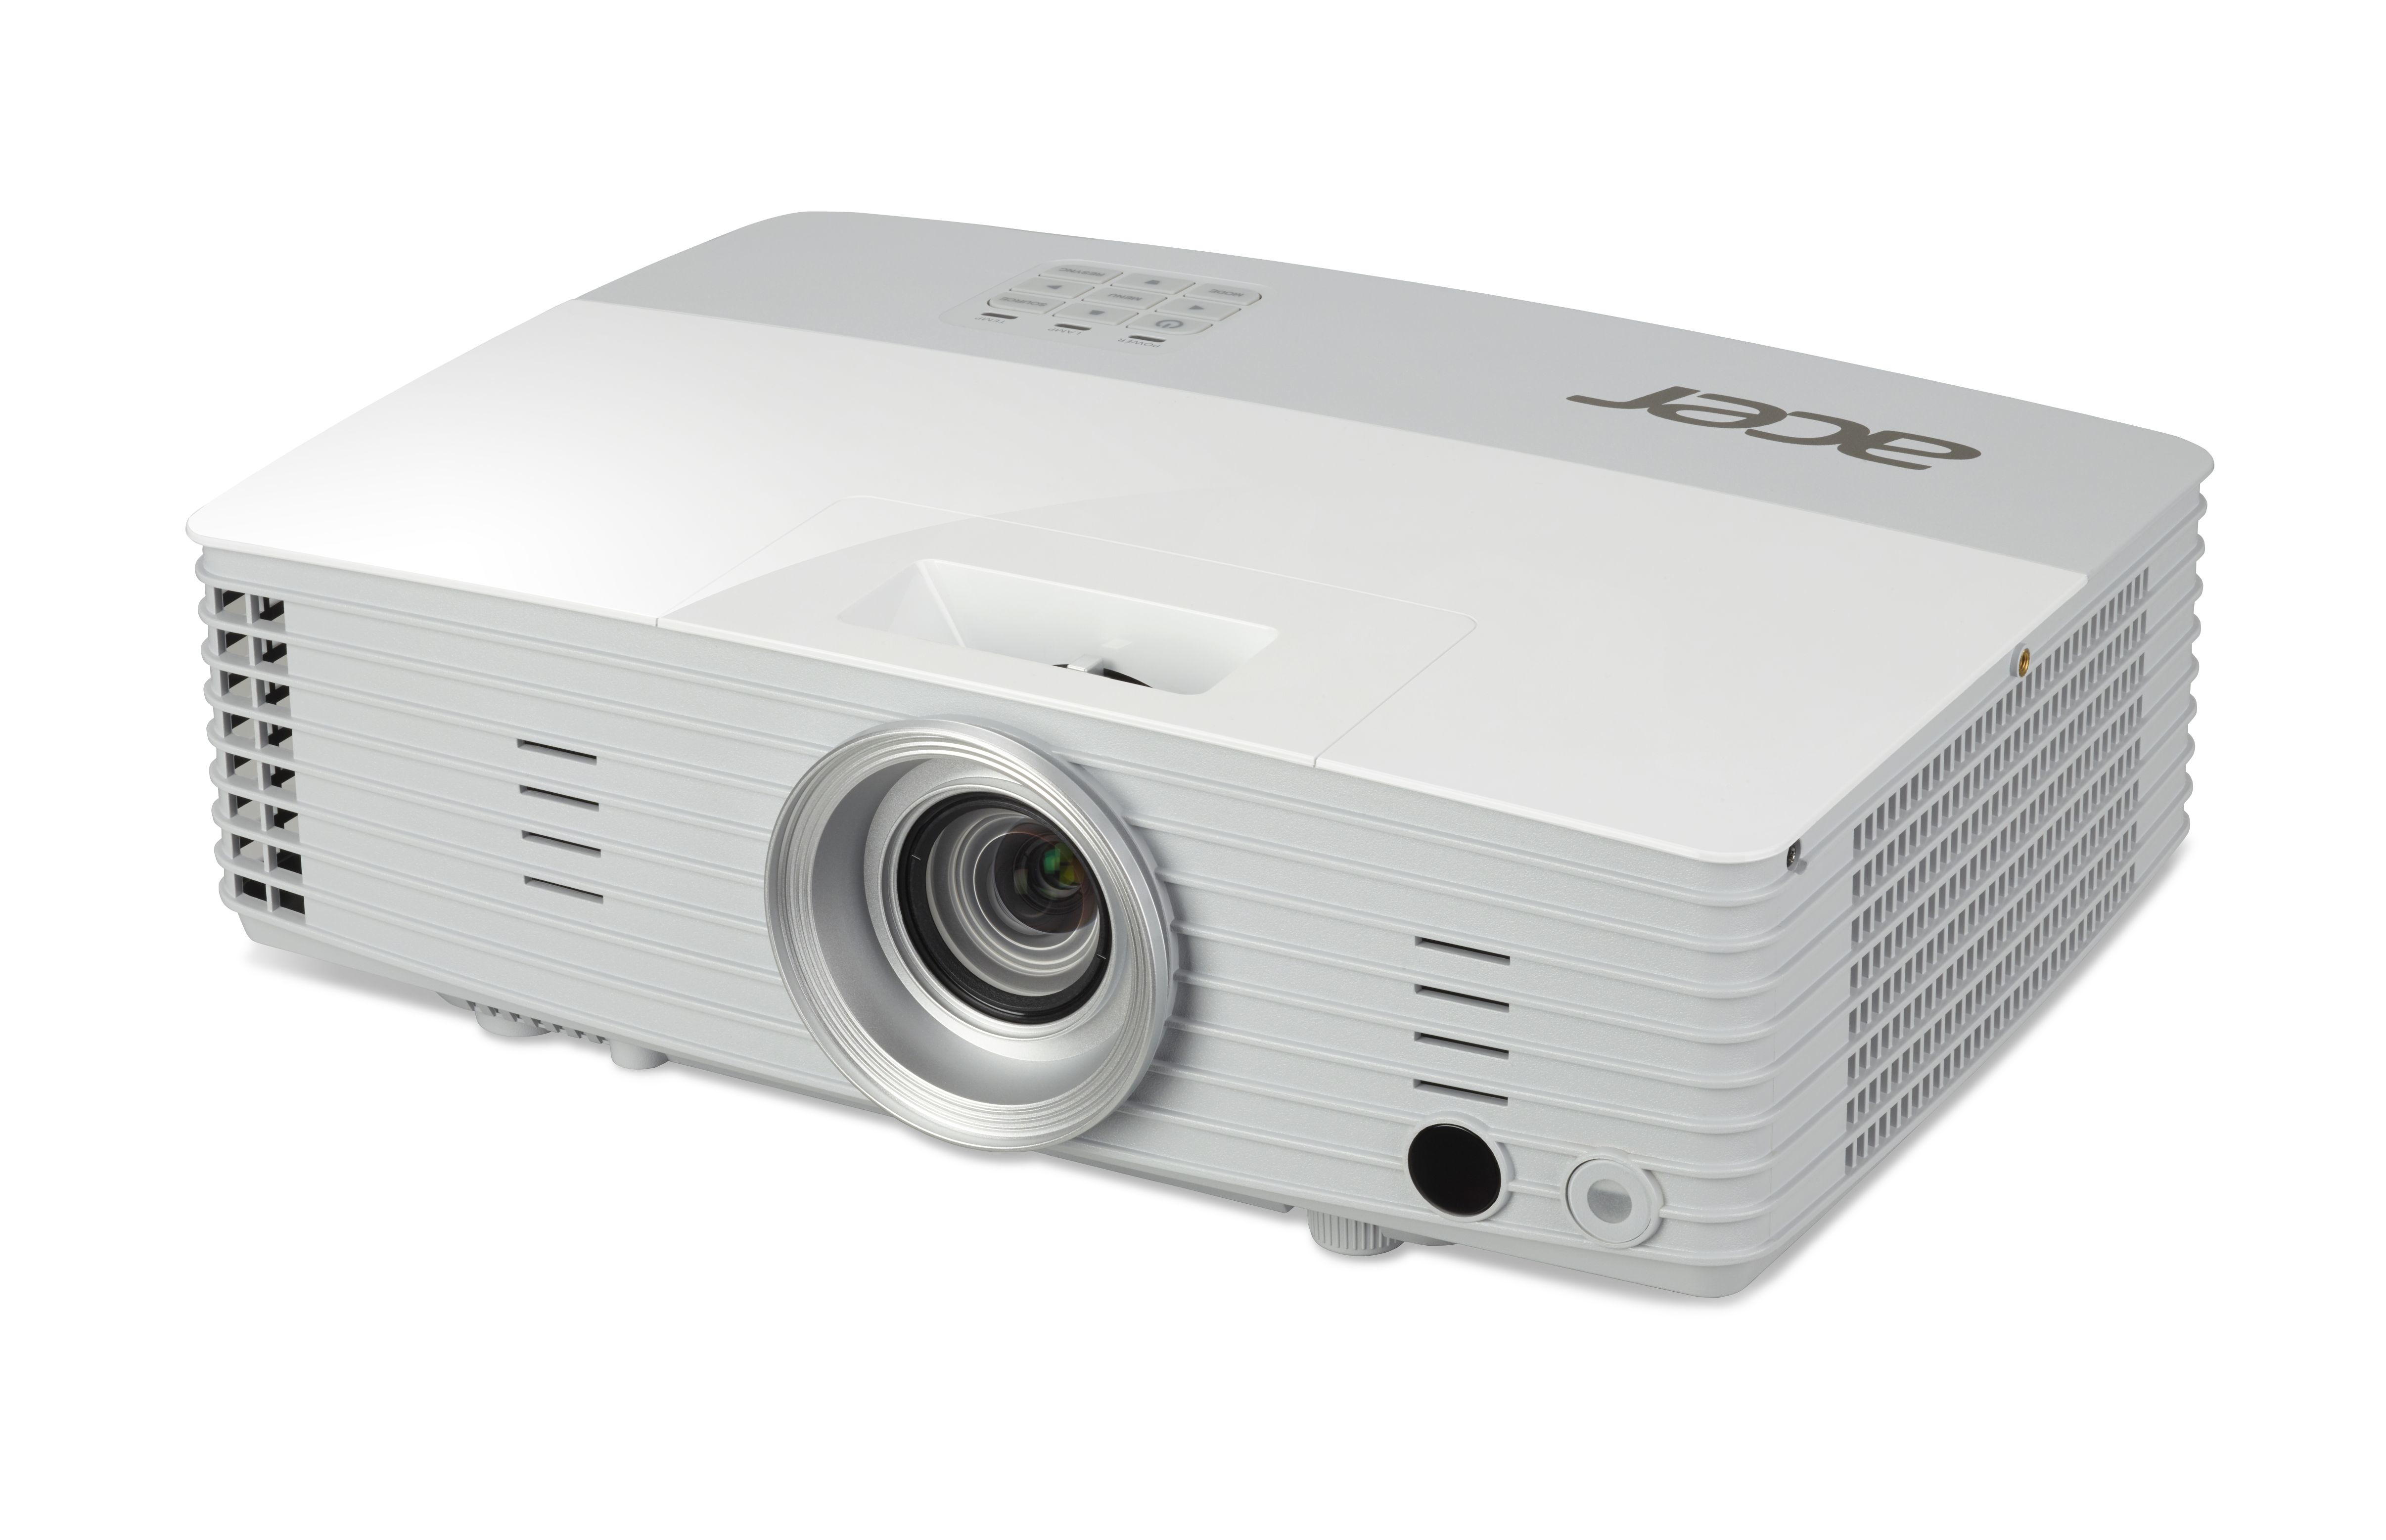 ACER P5627 DLP Projektor 4000 ANSI Lumen WUXGA 1920x1200 3D ready 20.000:1 2x HDMI/MHL 2x D-Sub RJ45 Composite Audio weiss